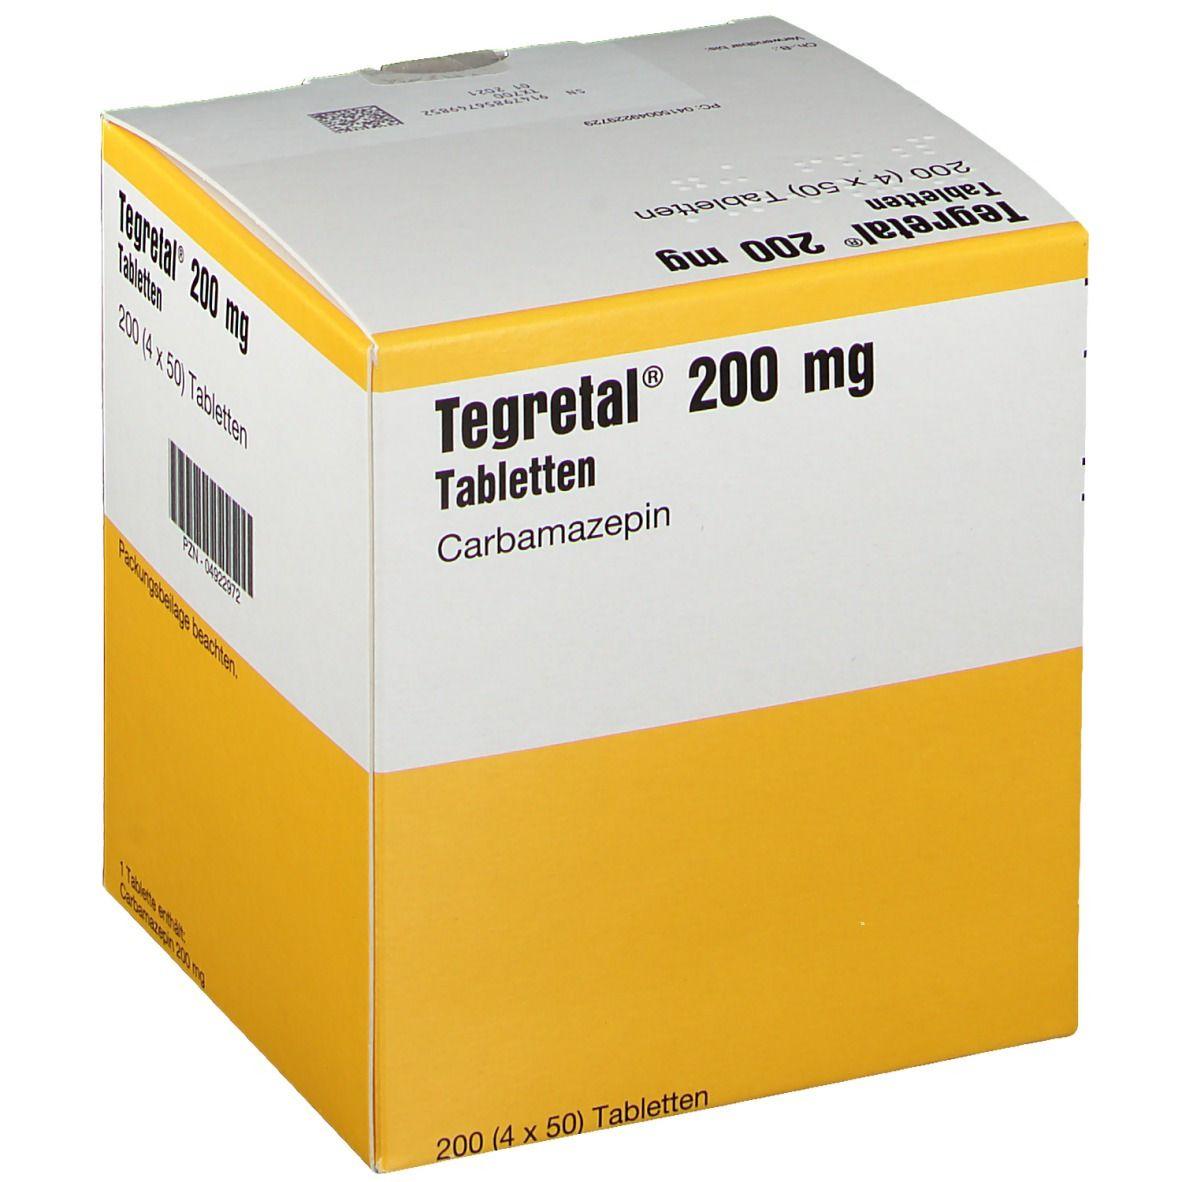 Tegretal 200 Tabletten 4X50 St - shop-apotheke.com